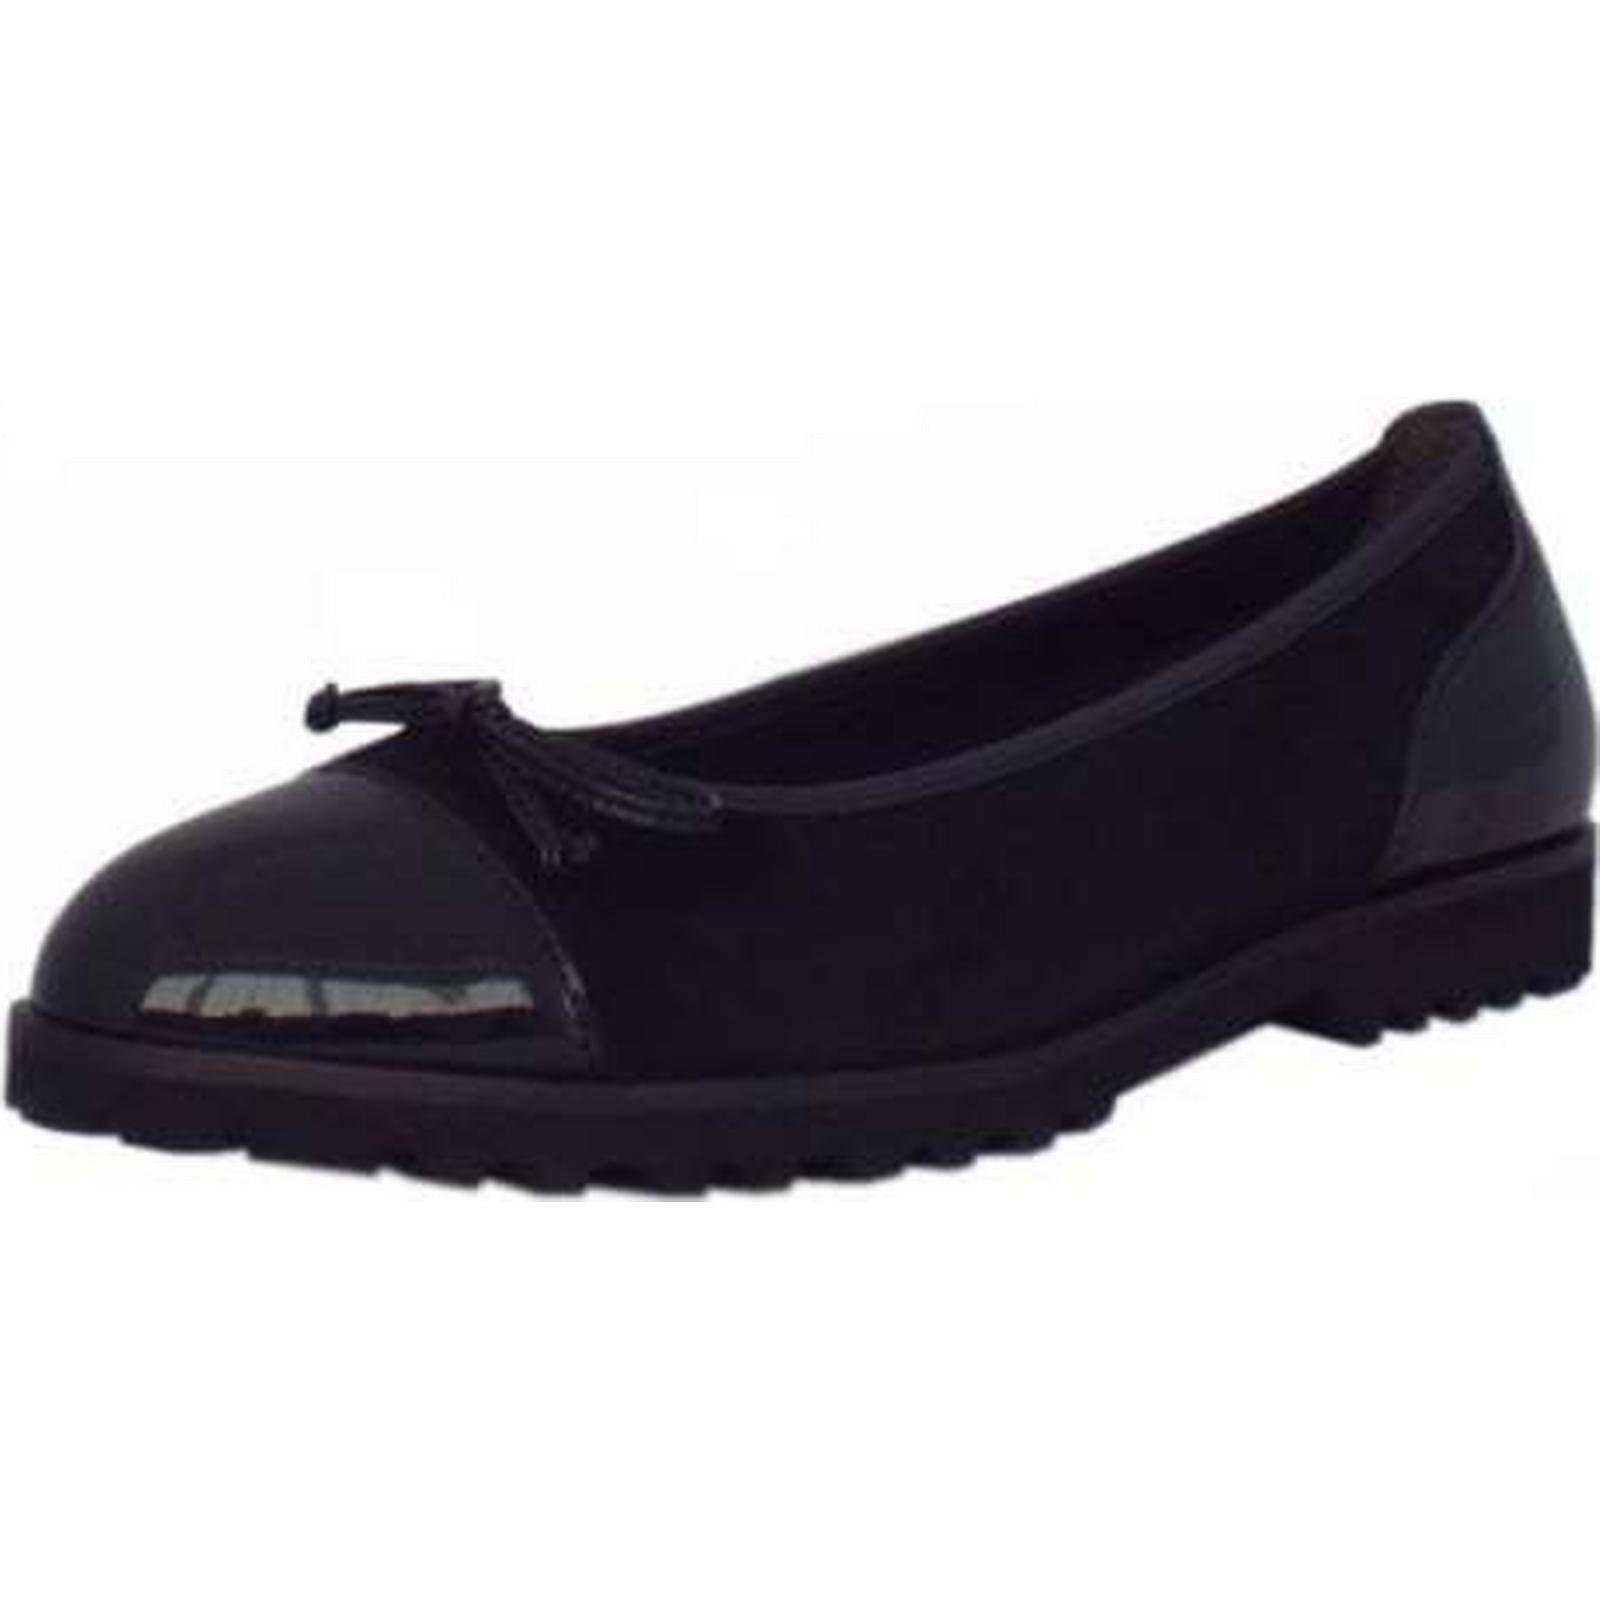 gabor tentation gabor gabor gabor mesdames chaussures taille: 5,5, en daim couleur: marine 65bf76